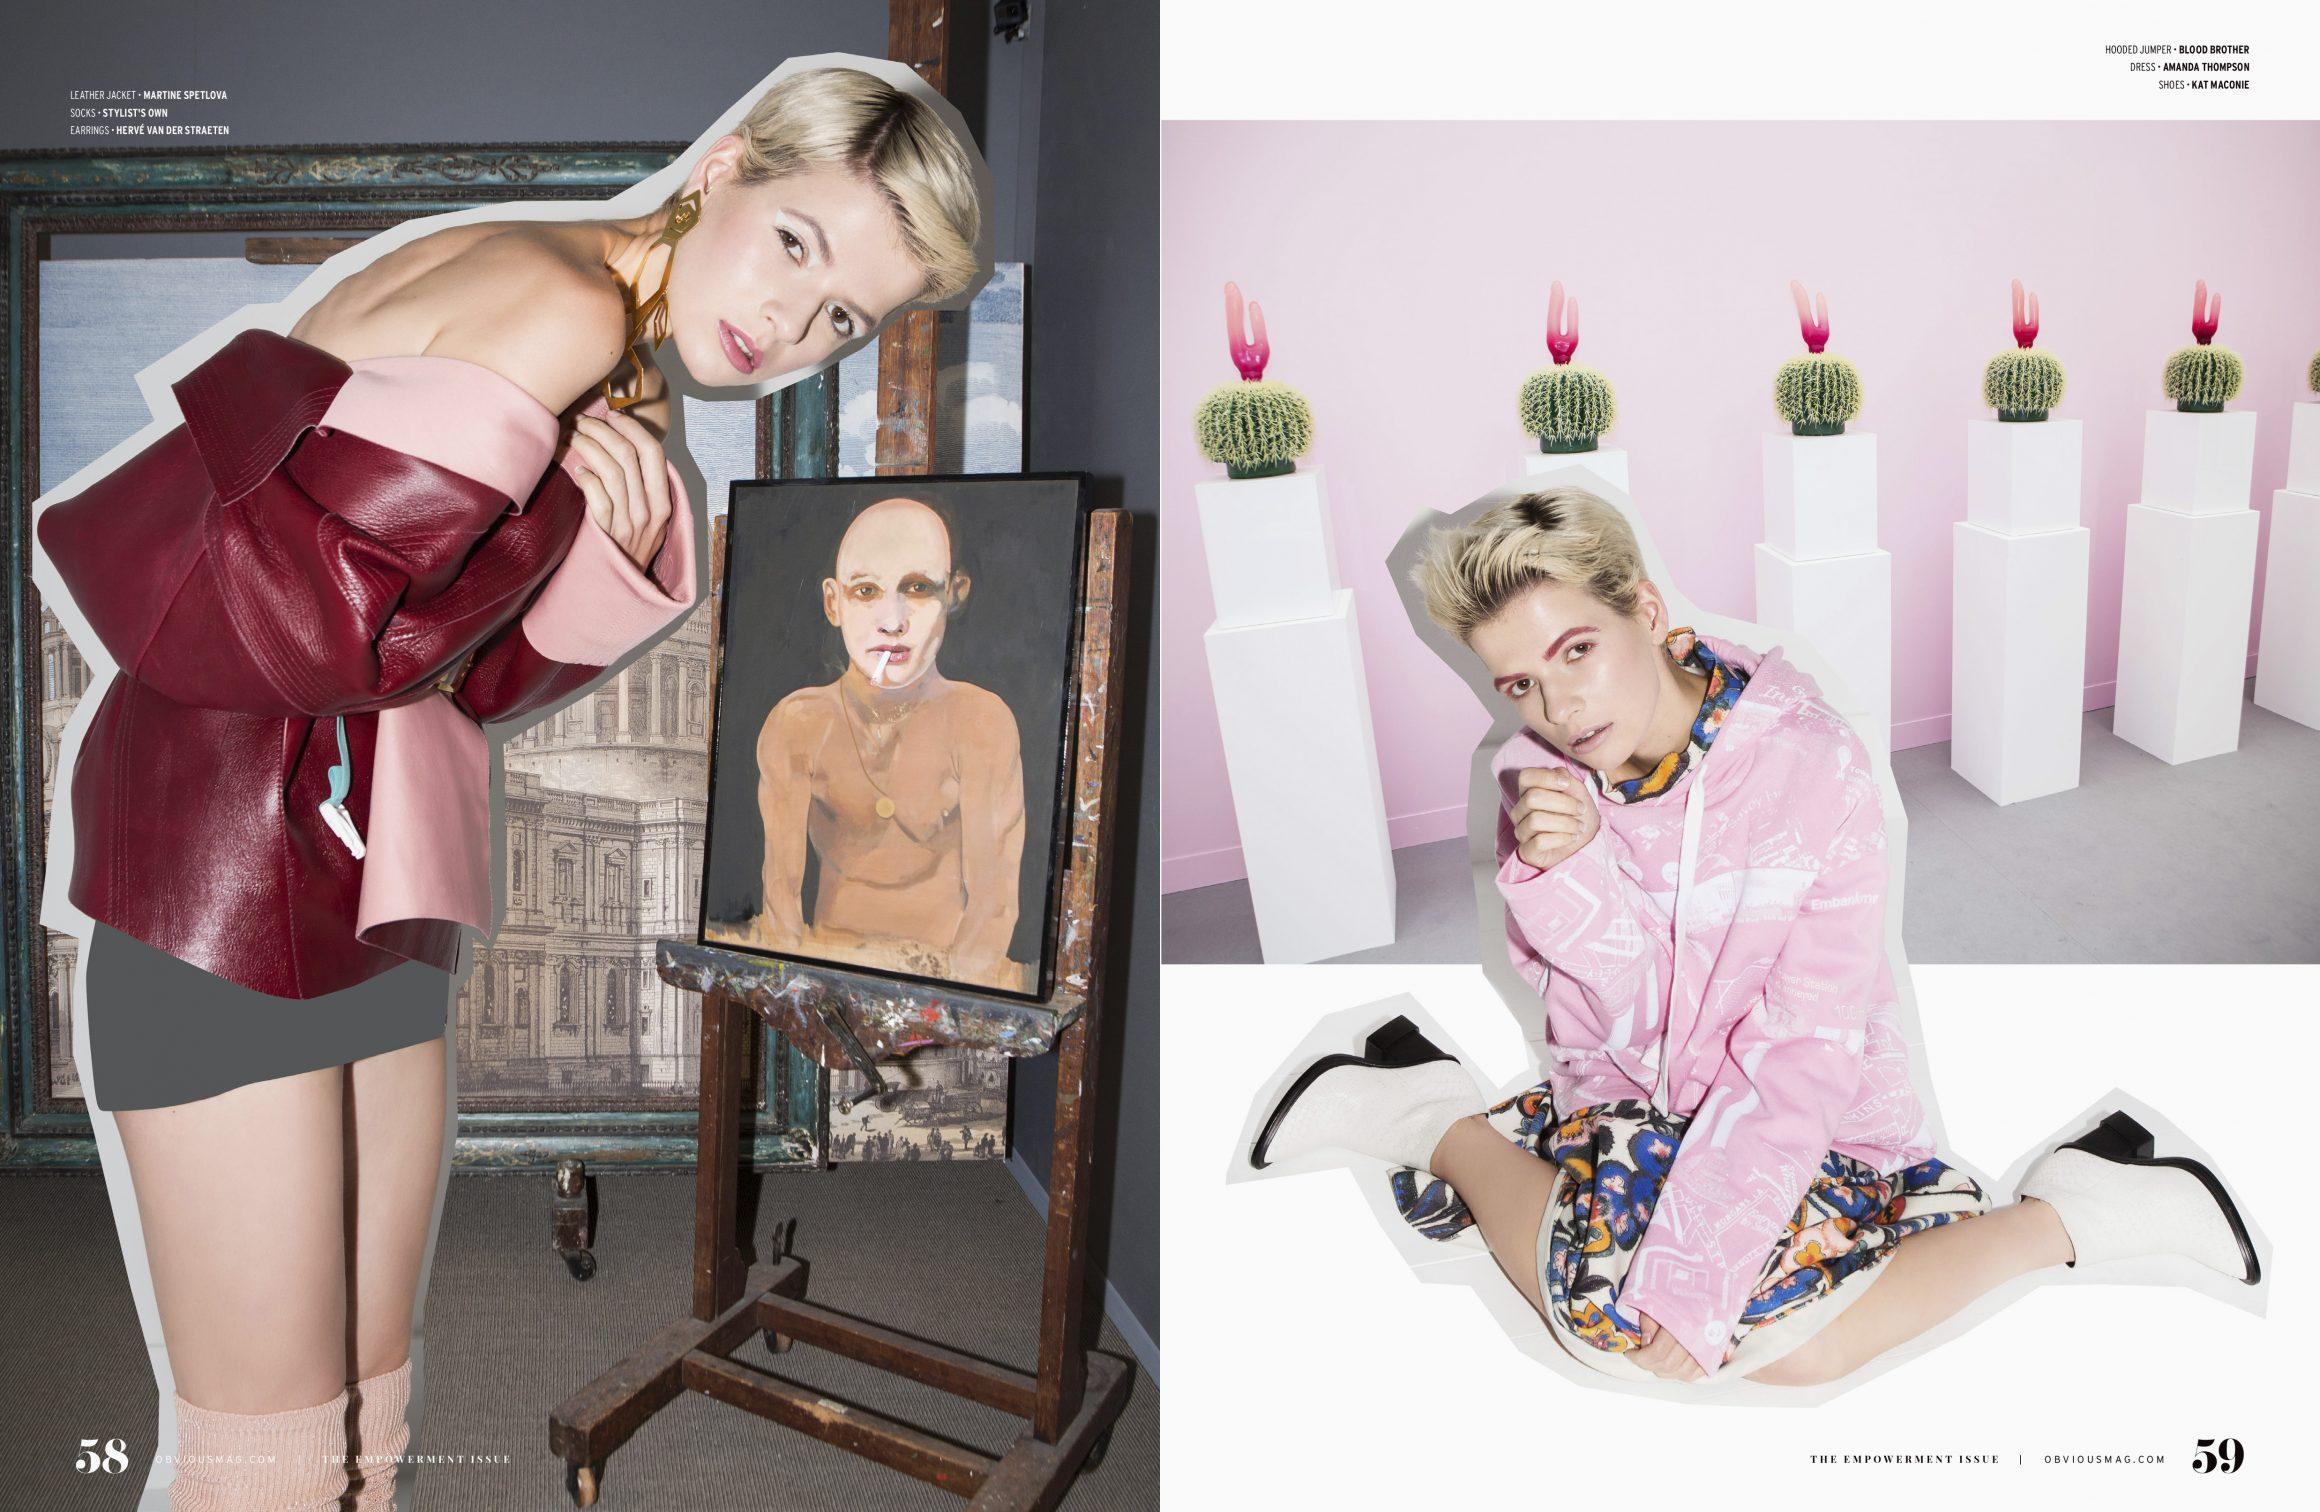 Art-Of-Fashion-3-2320x1512.jpg